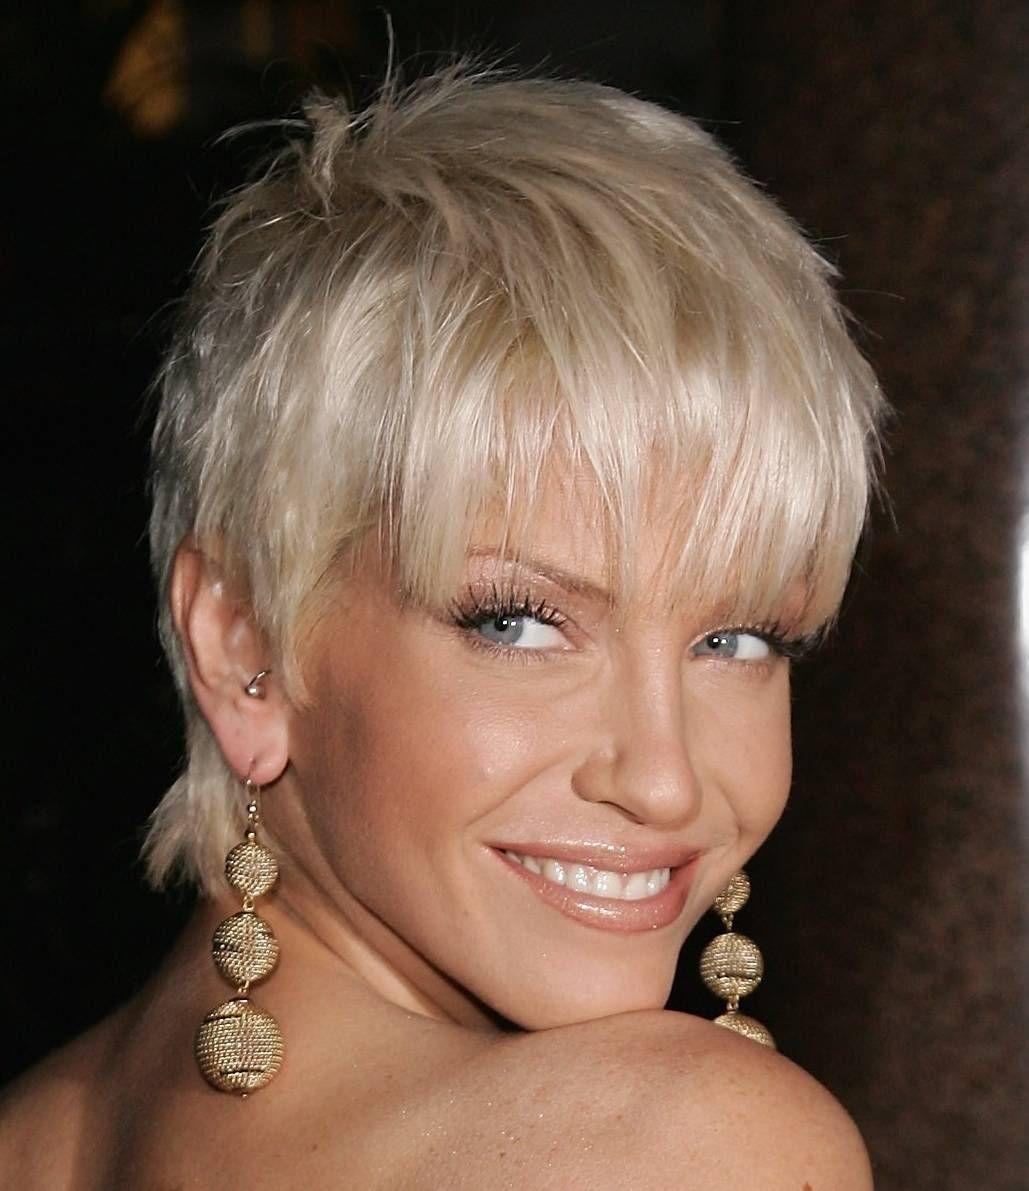 20+ Best Hair styles for women. images | hair styles, hair, long hair styles